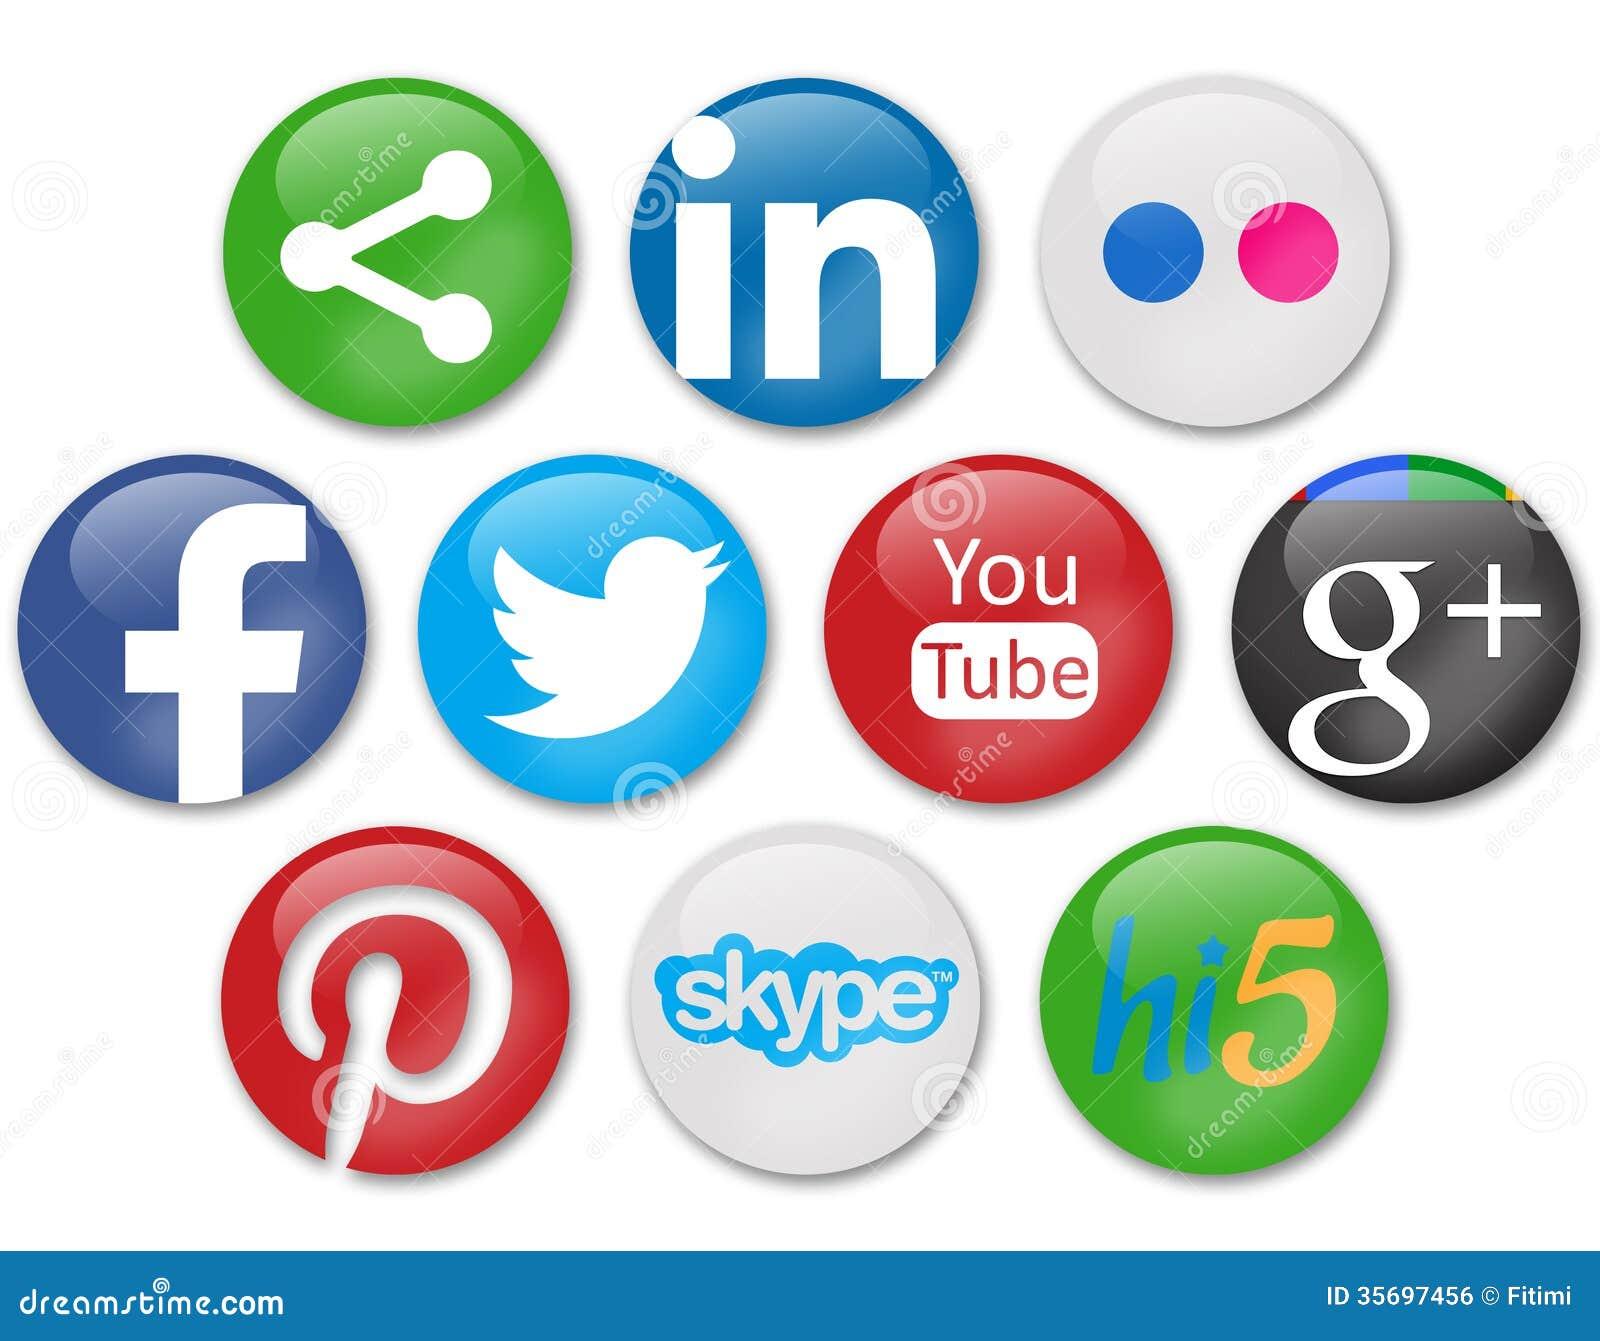 Internet Social Networks - Addiction - Help for Internet Addiction